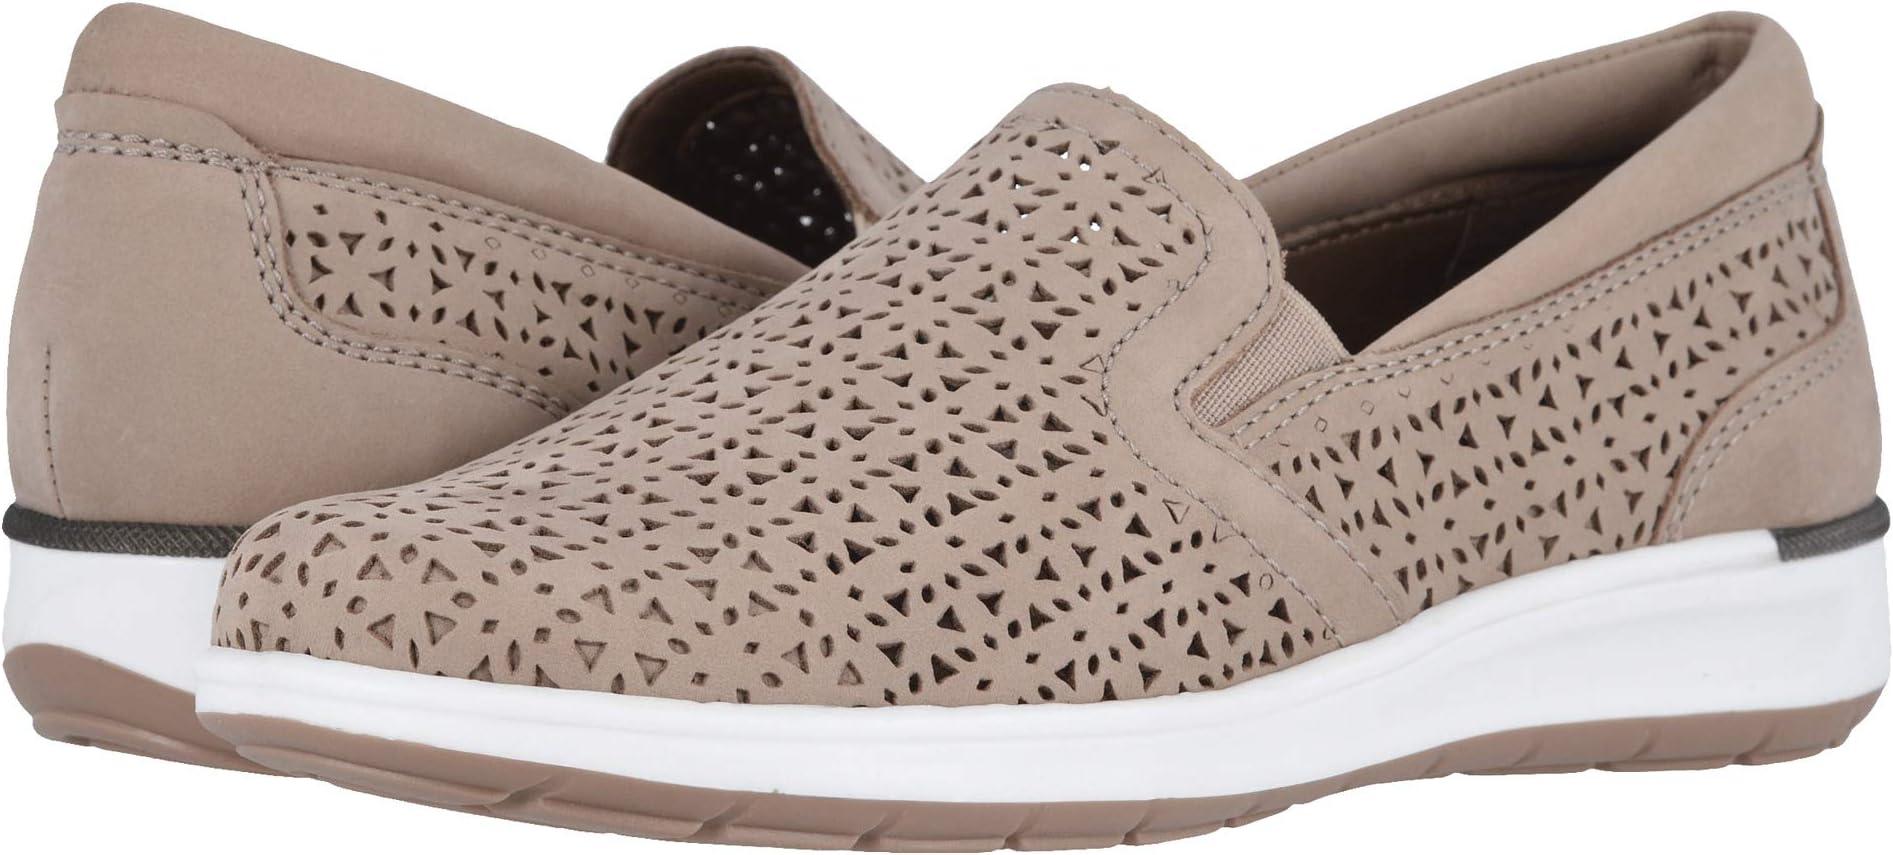 TC-3-Sneakers-2019-03-20